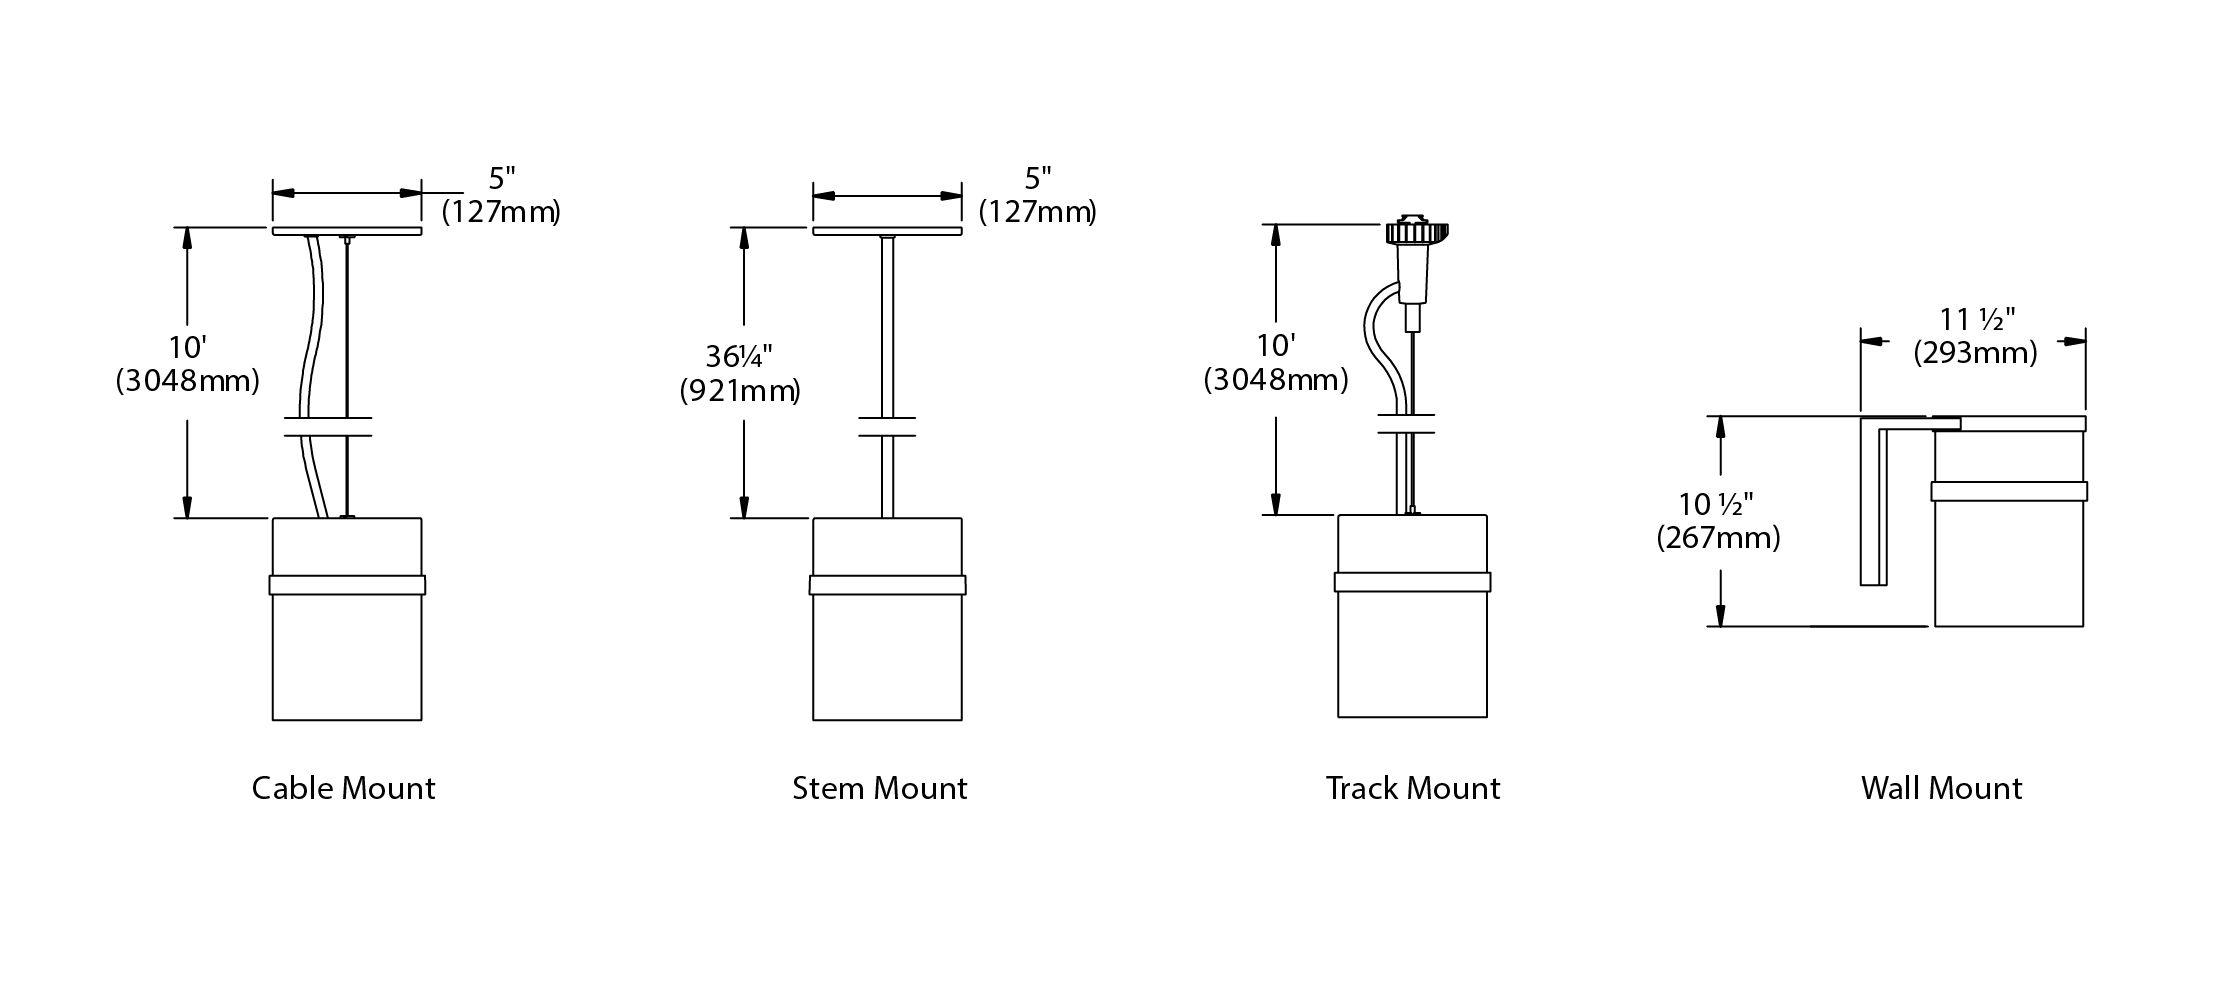 Lightolier 0 10v Dimming Schematic Wire Center Led Downlight Wiring Diagram C7l15c Calculite 7 Inch Round Aperture 1500 Lumens Rh Alconlighting Com Control Lutron Ballast